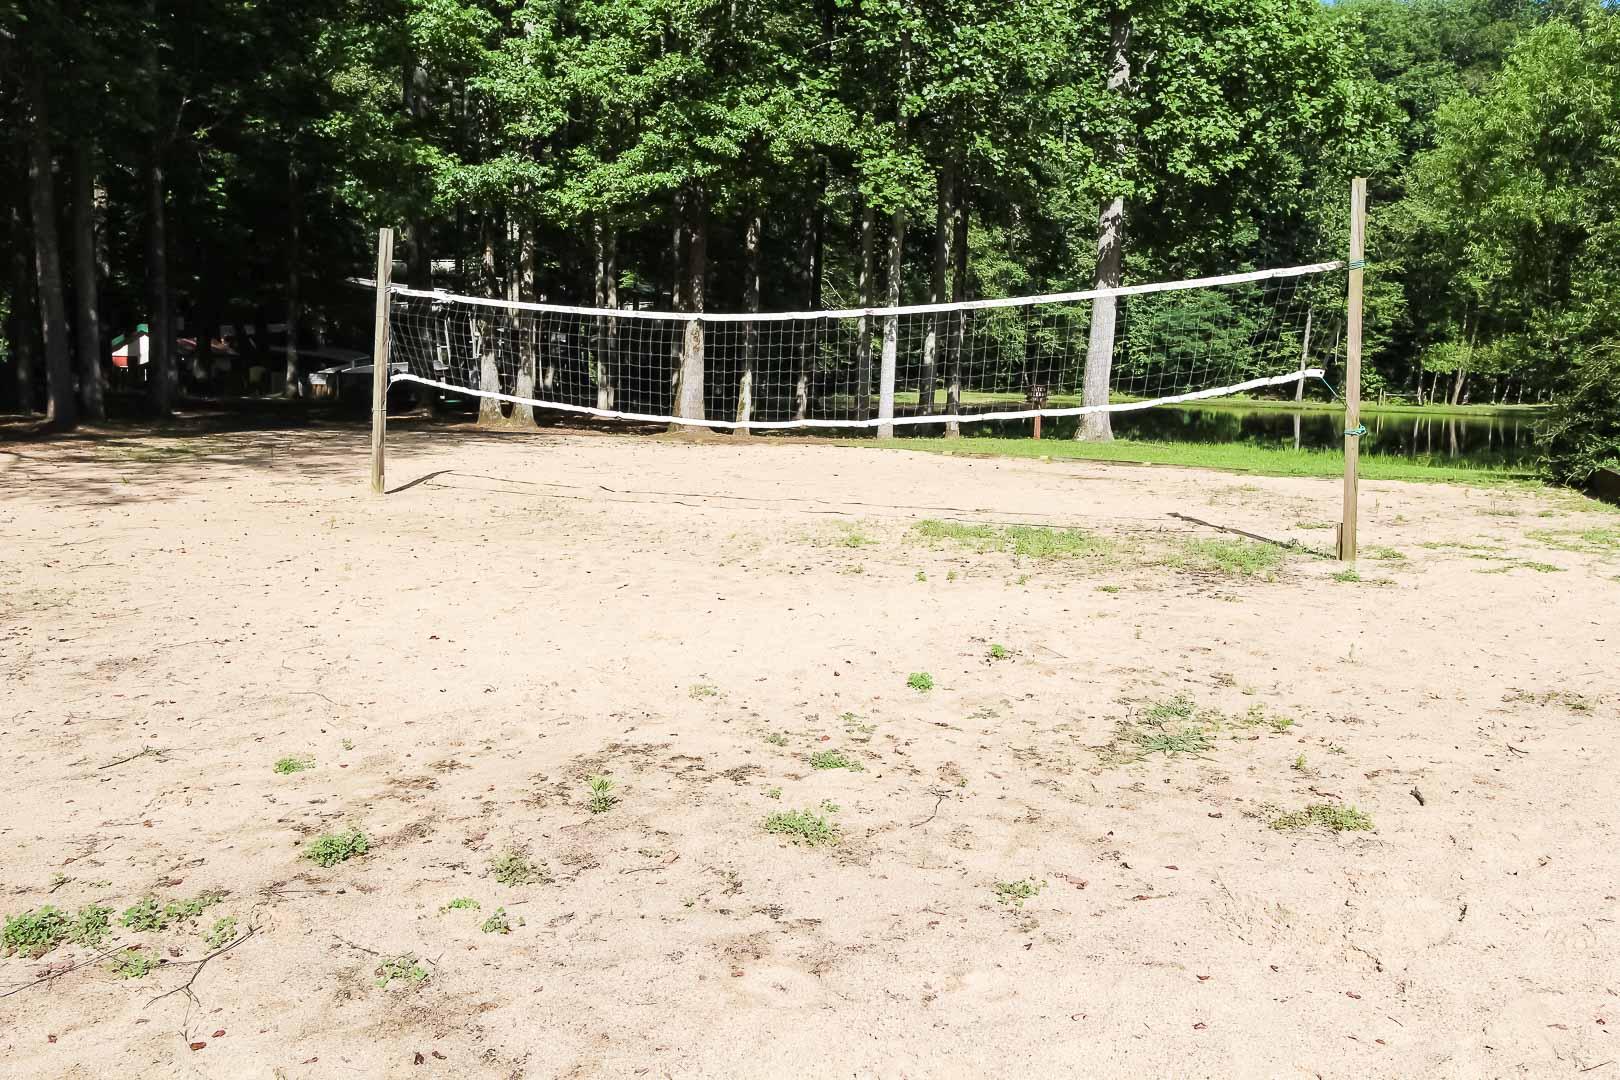 An enjoyable volleyball field at VRI's Alpine Crest Resort in Georgia.